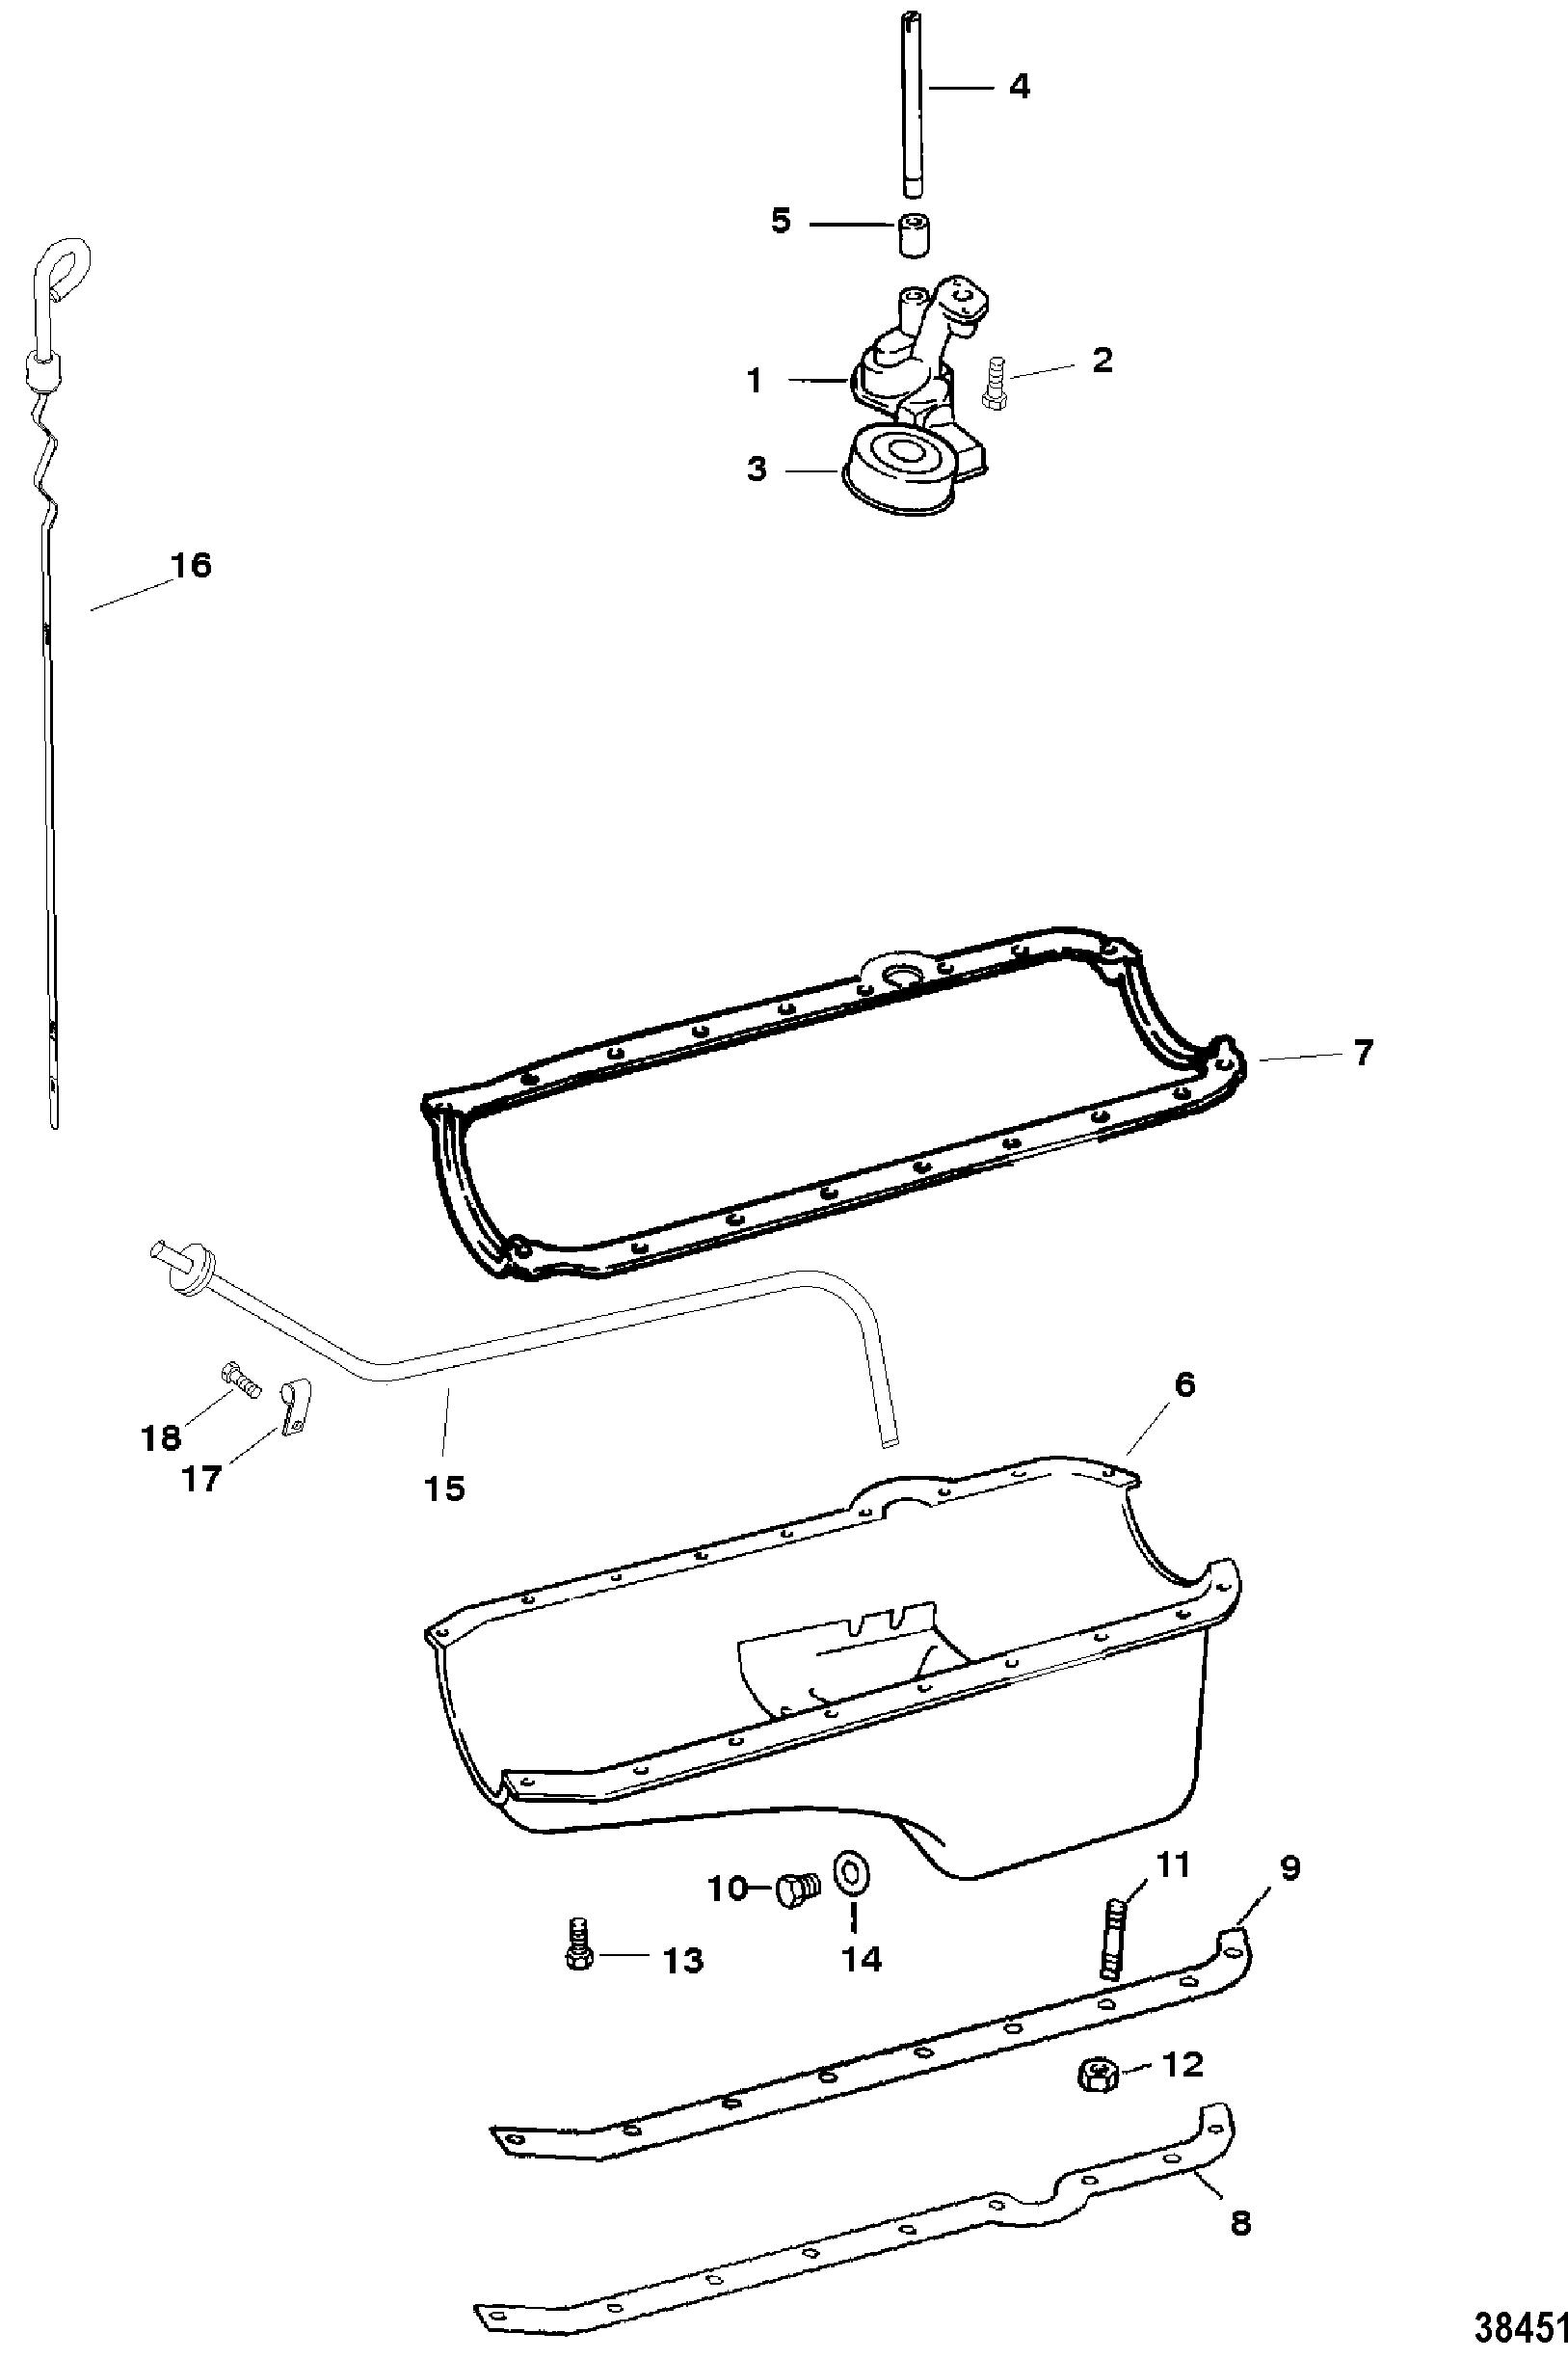 Mercruiser 4 3lx Gen Ii 4 Bbl Gm 262 V 6 0f